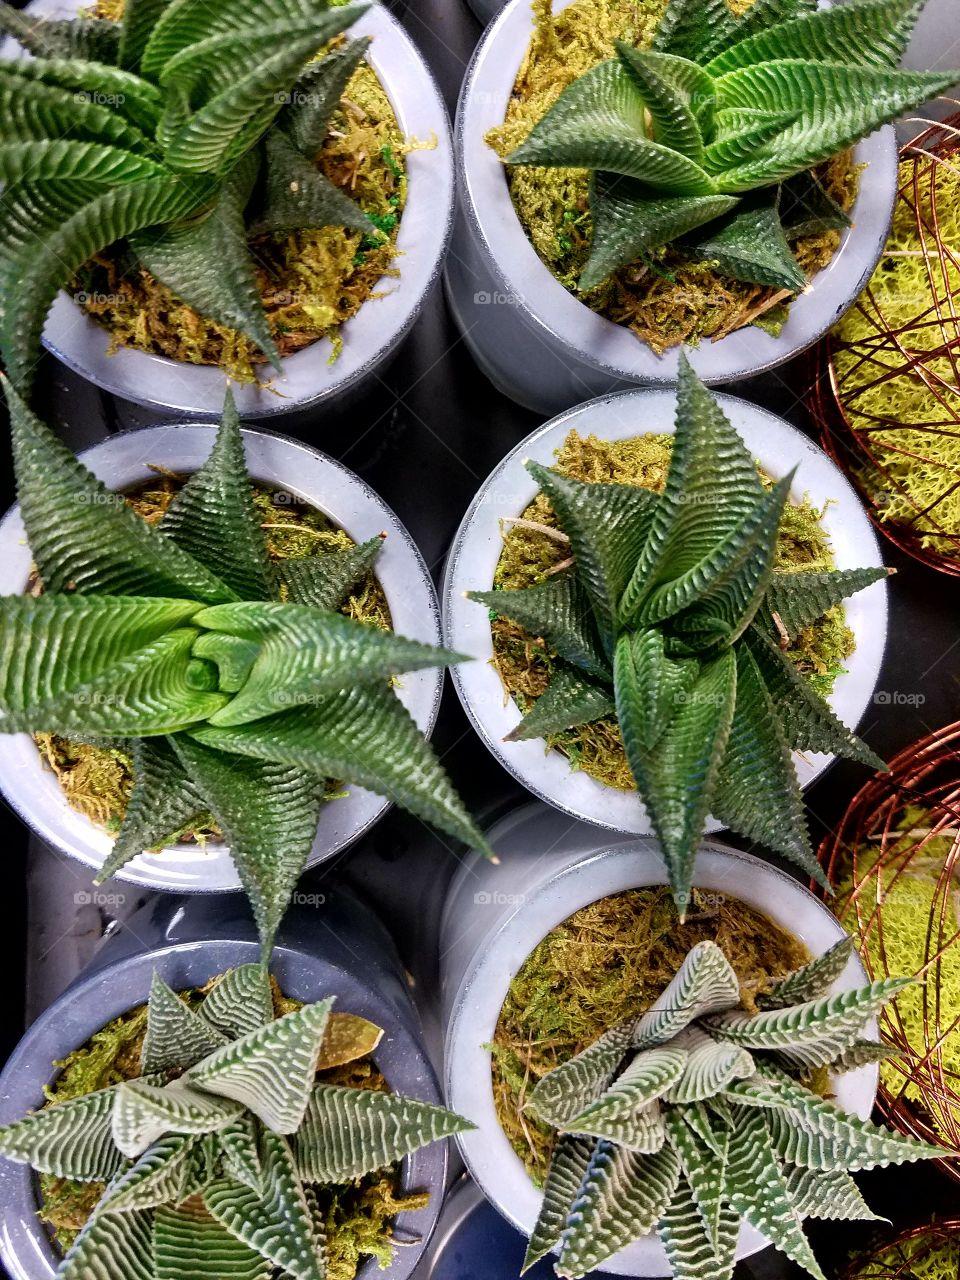 Miniature cactus plants